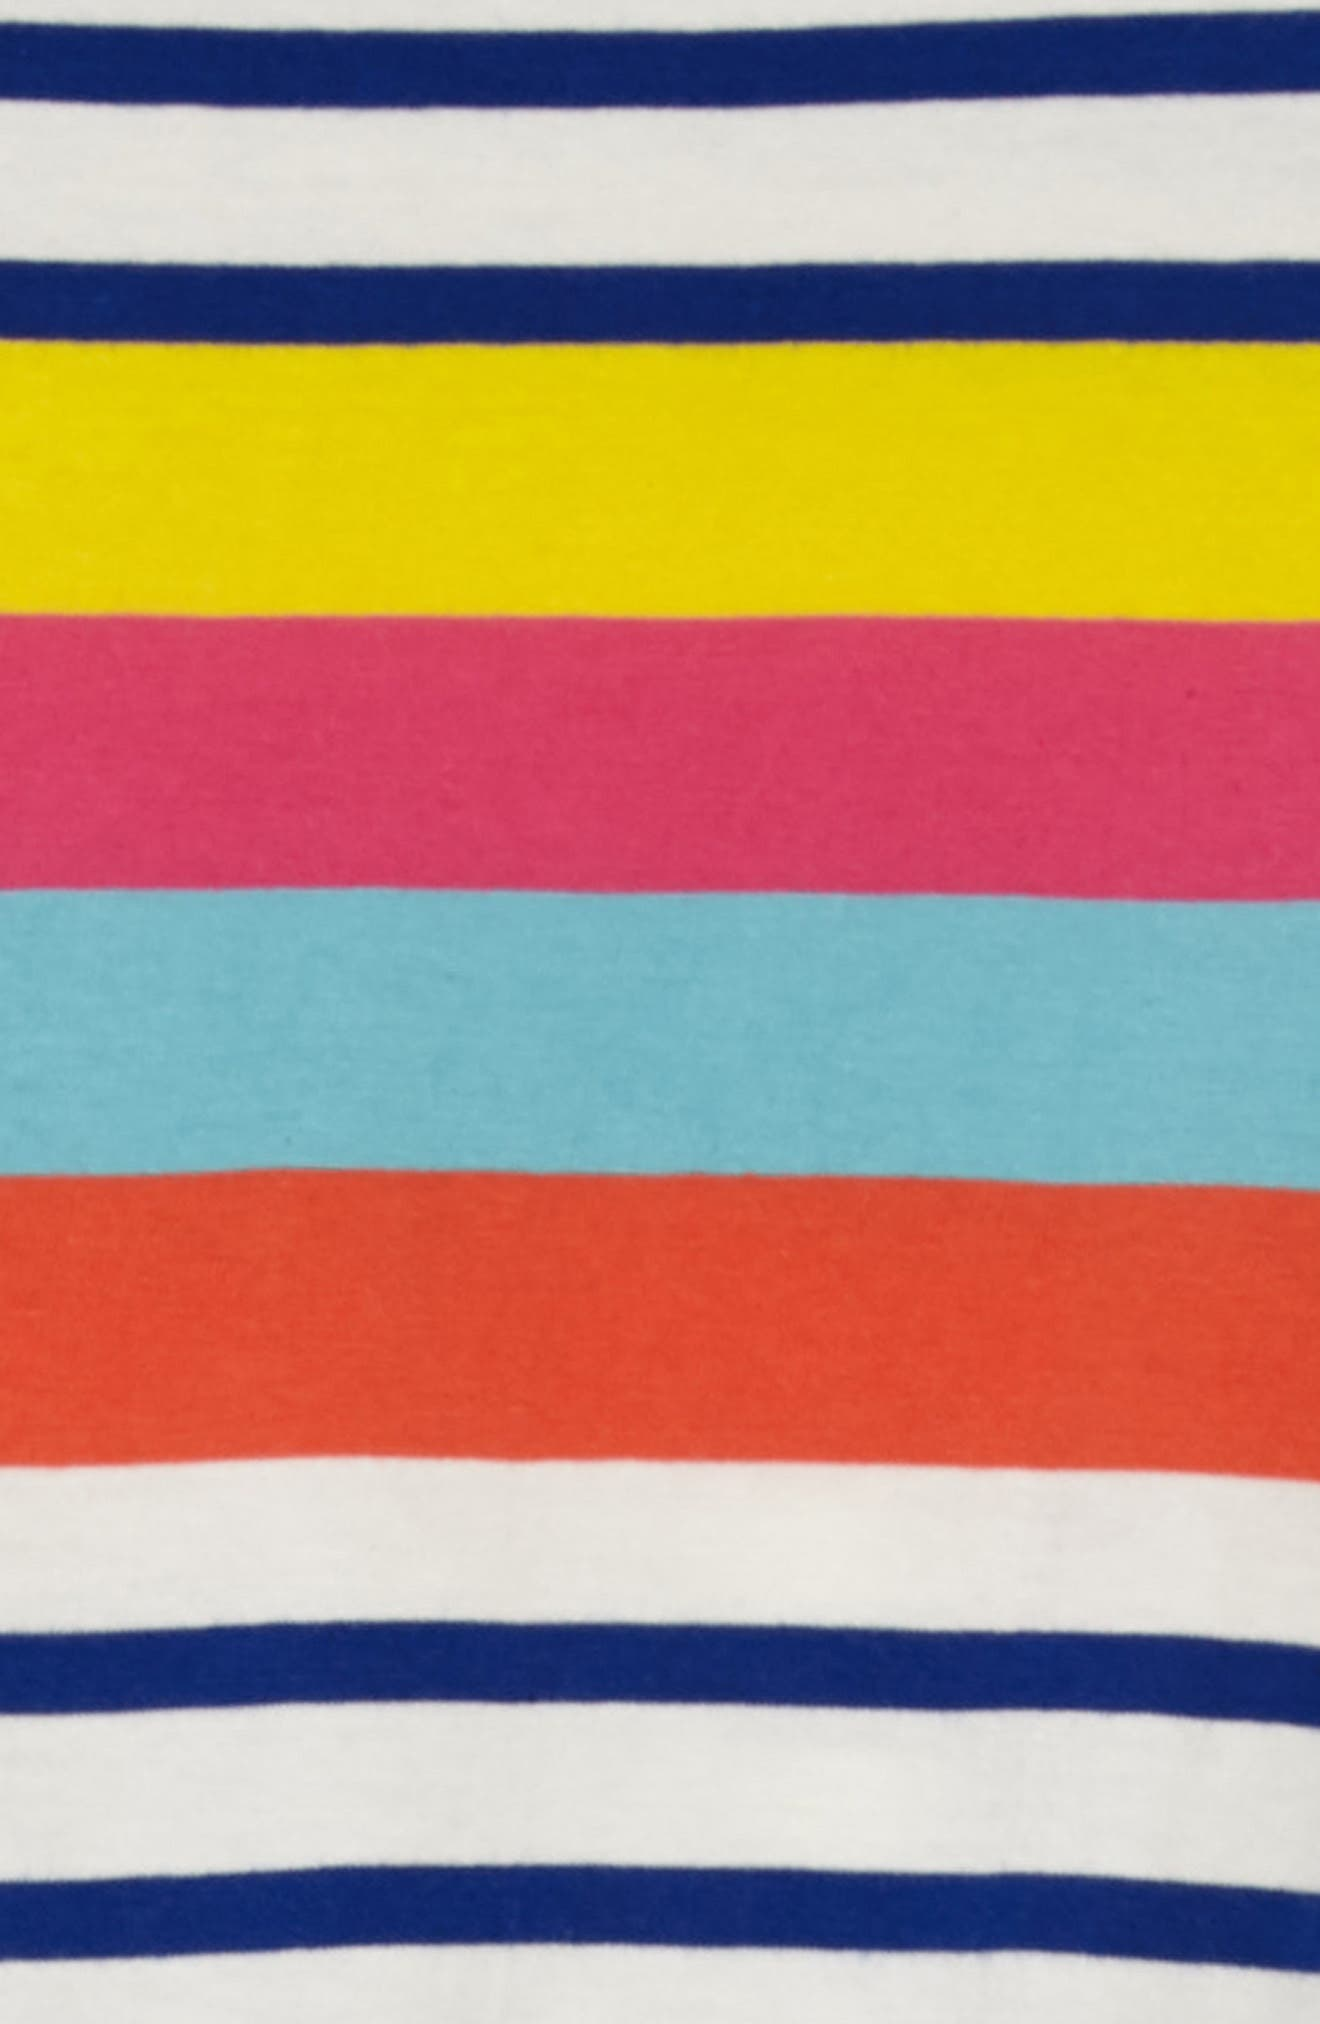 Tie Waist Jersey Dress,                             Alternate thumbnail 3, color,                             Sunshine Yellow/ Pink Stripe